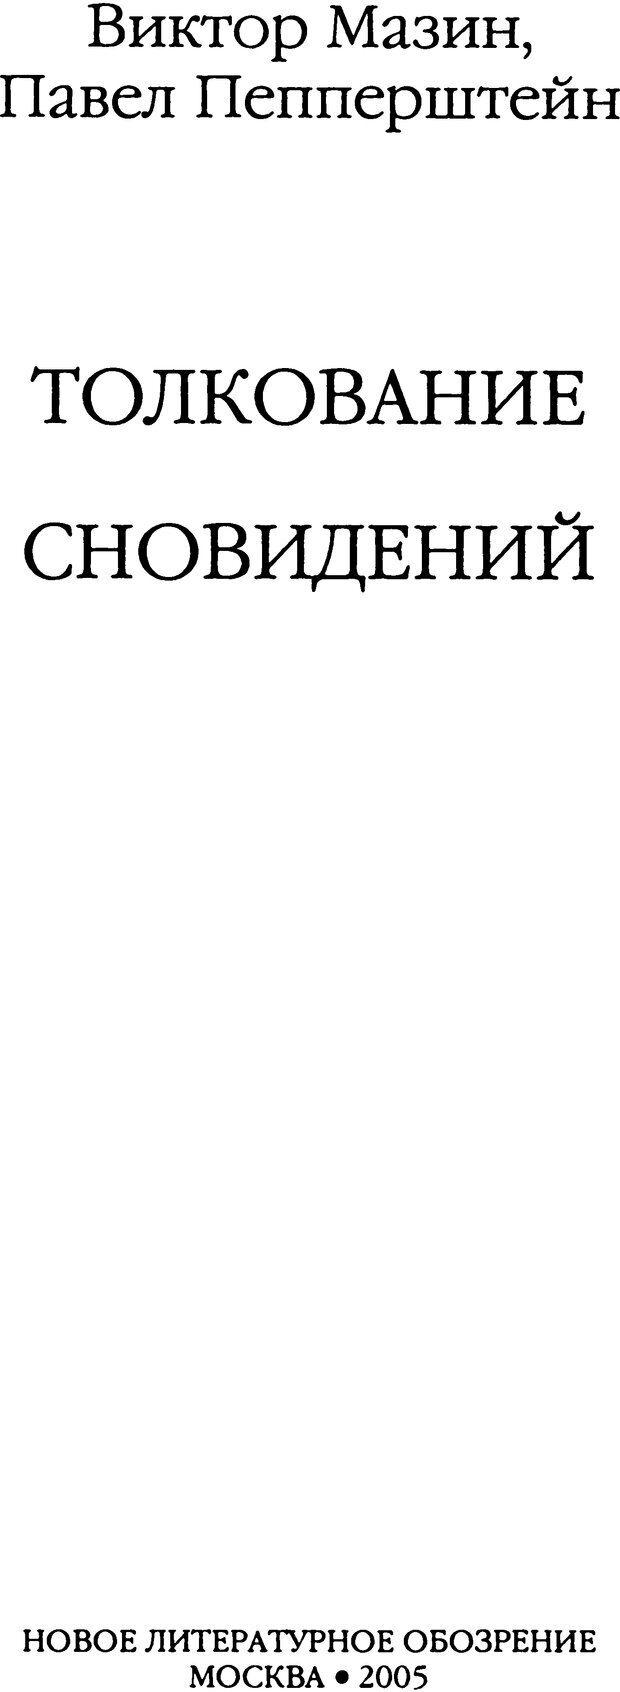 DJVU. Толкование сновидений. Мазин В. А. Страница 1. Читать онлайн